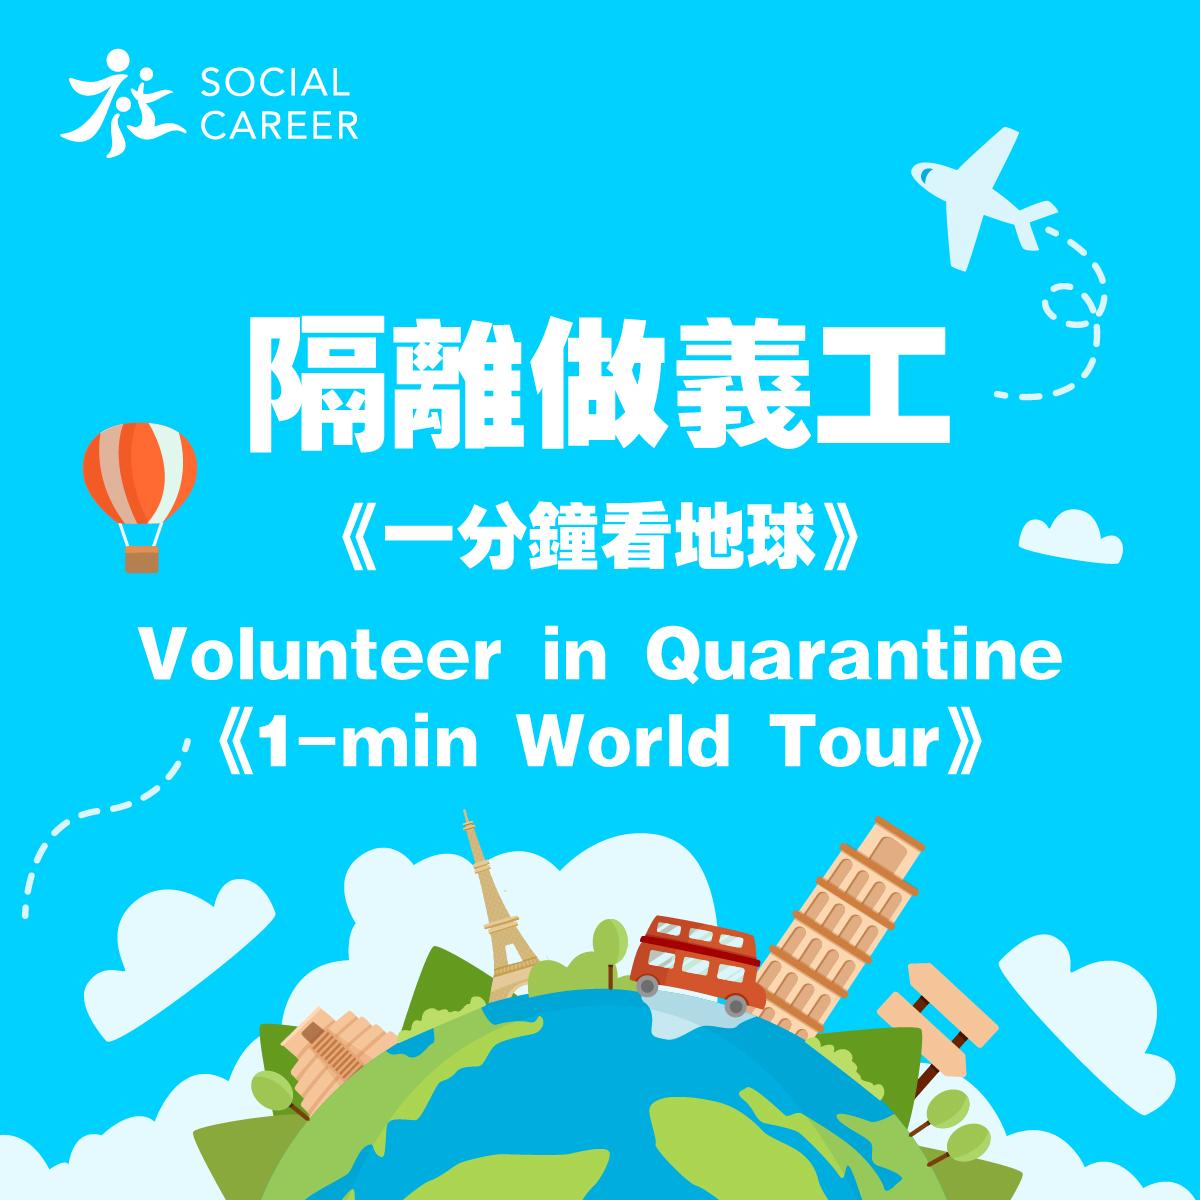 社職隔離做義工|一分鐘看地球 Volunteering in Quarantine 1-min World Tour